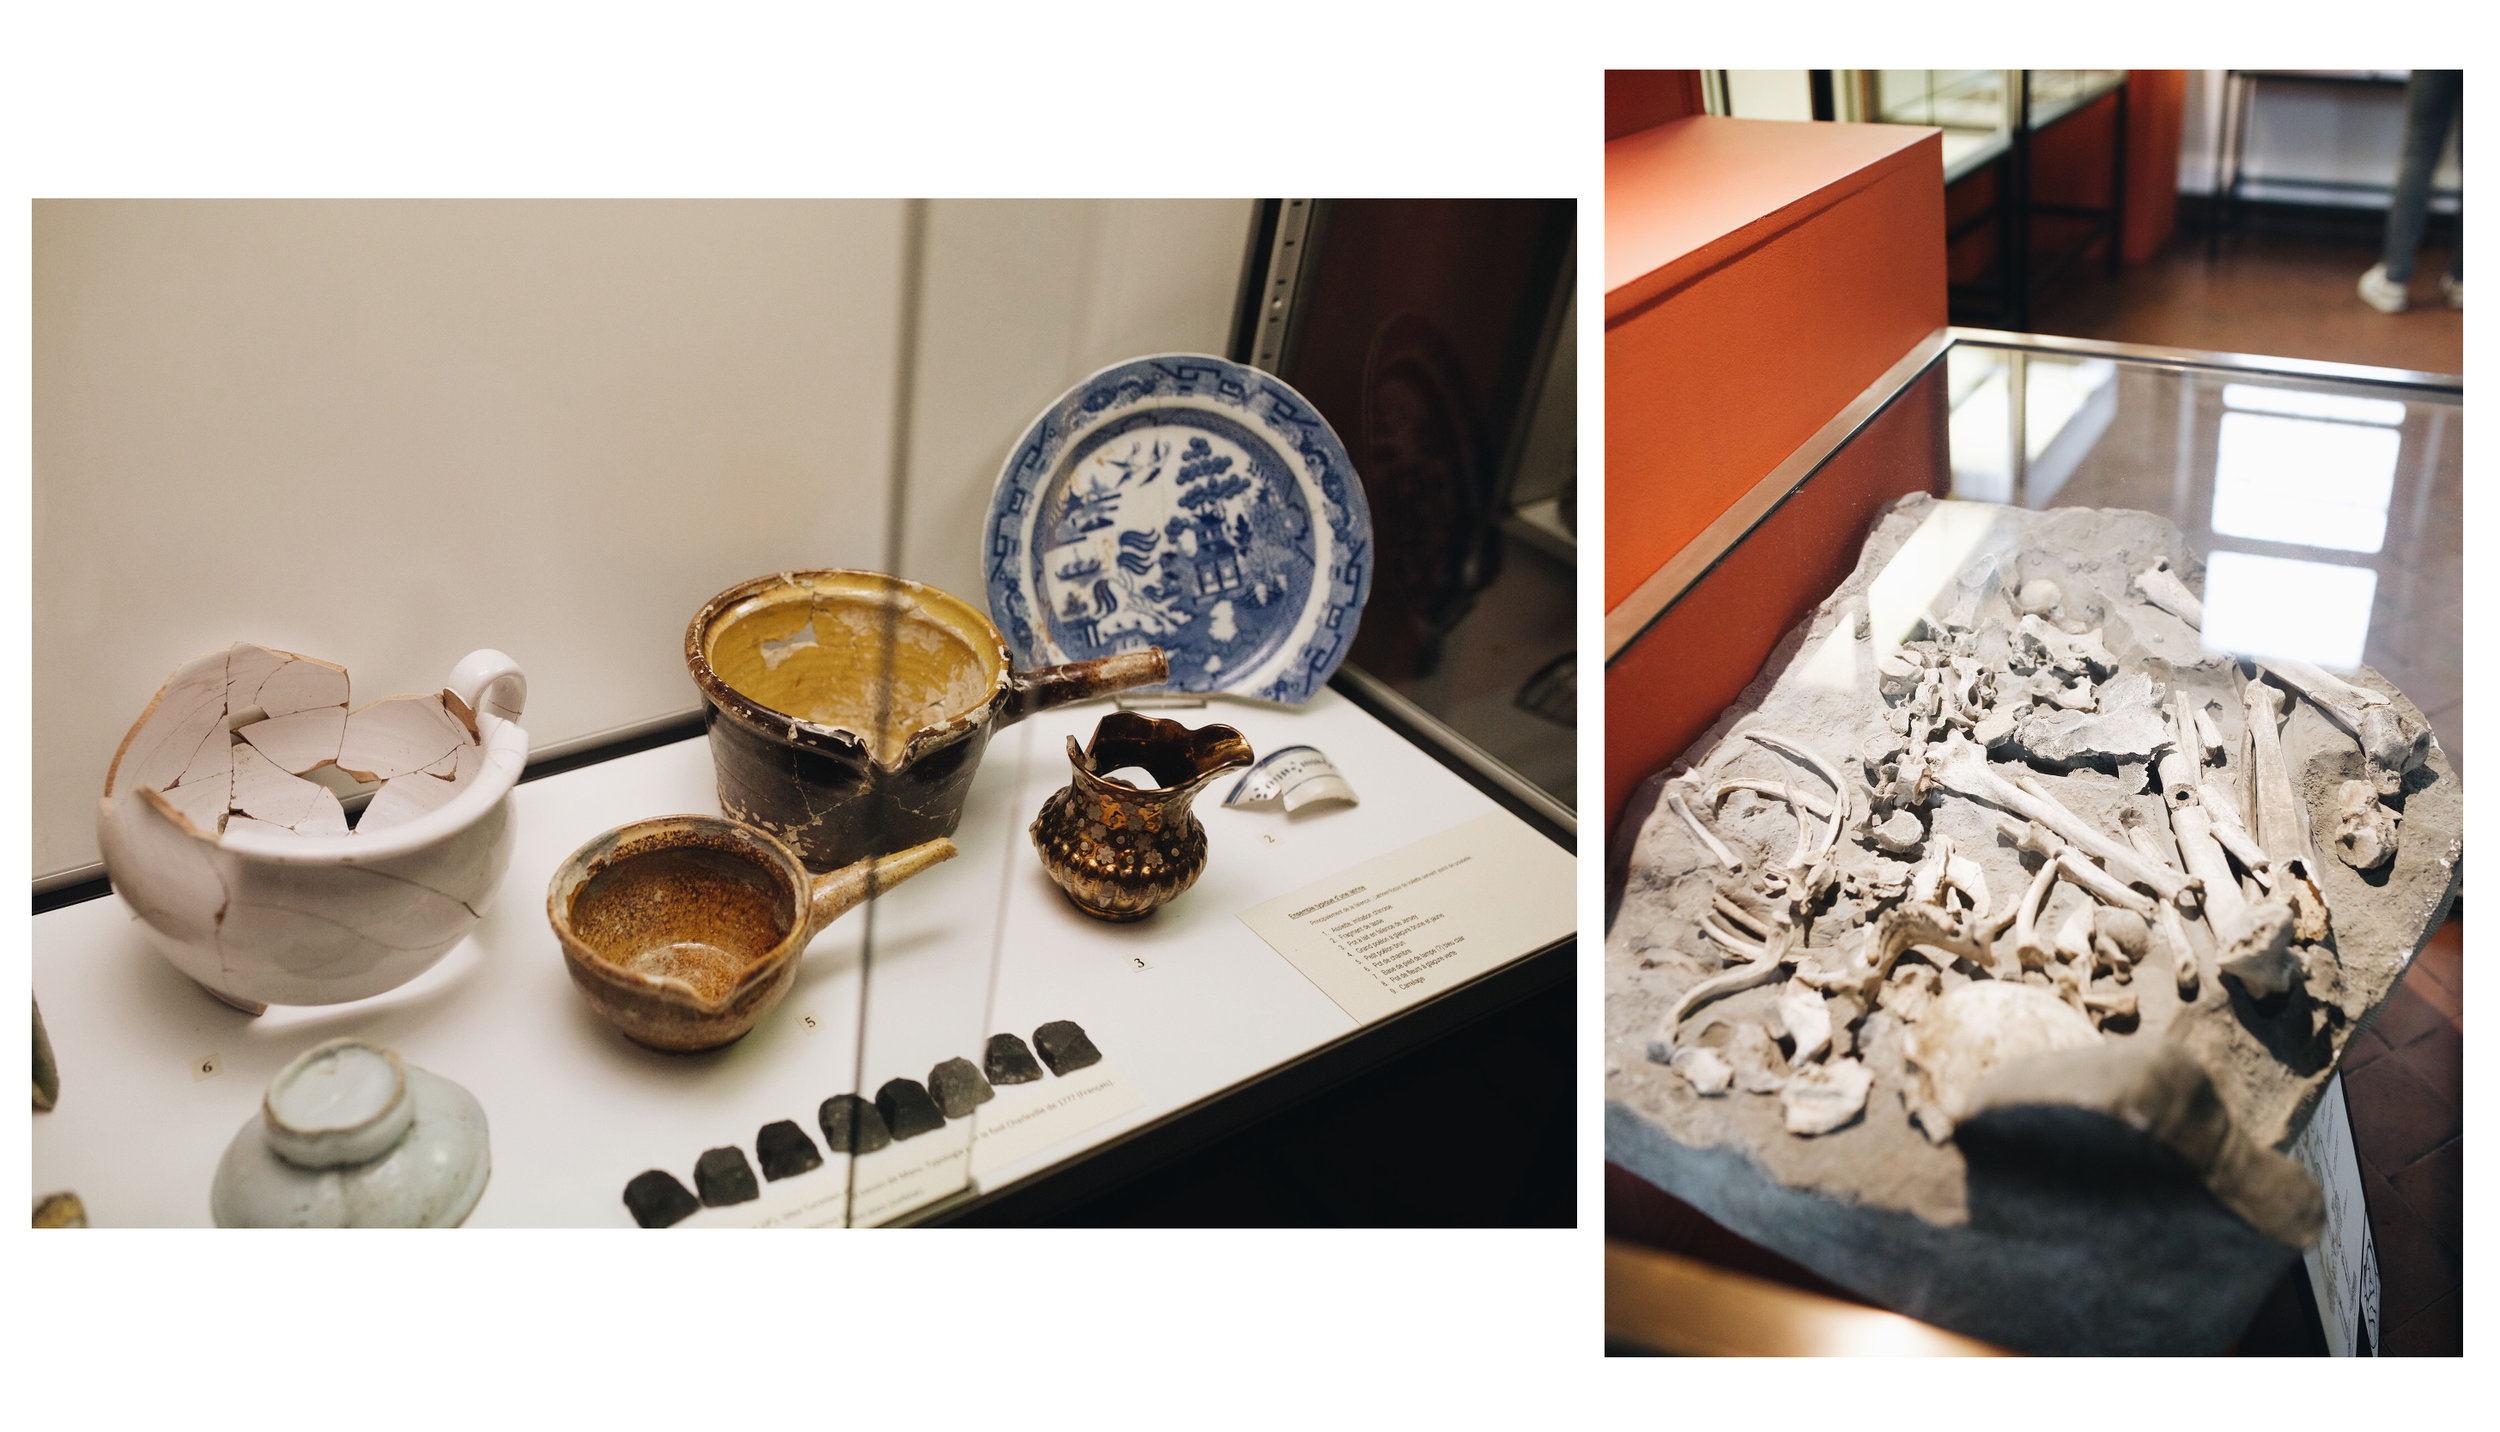 namur-musee-archeologique-wallonie-belgique.JPG